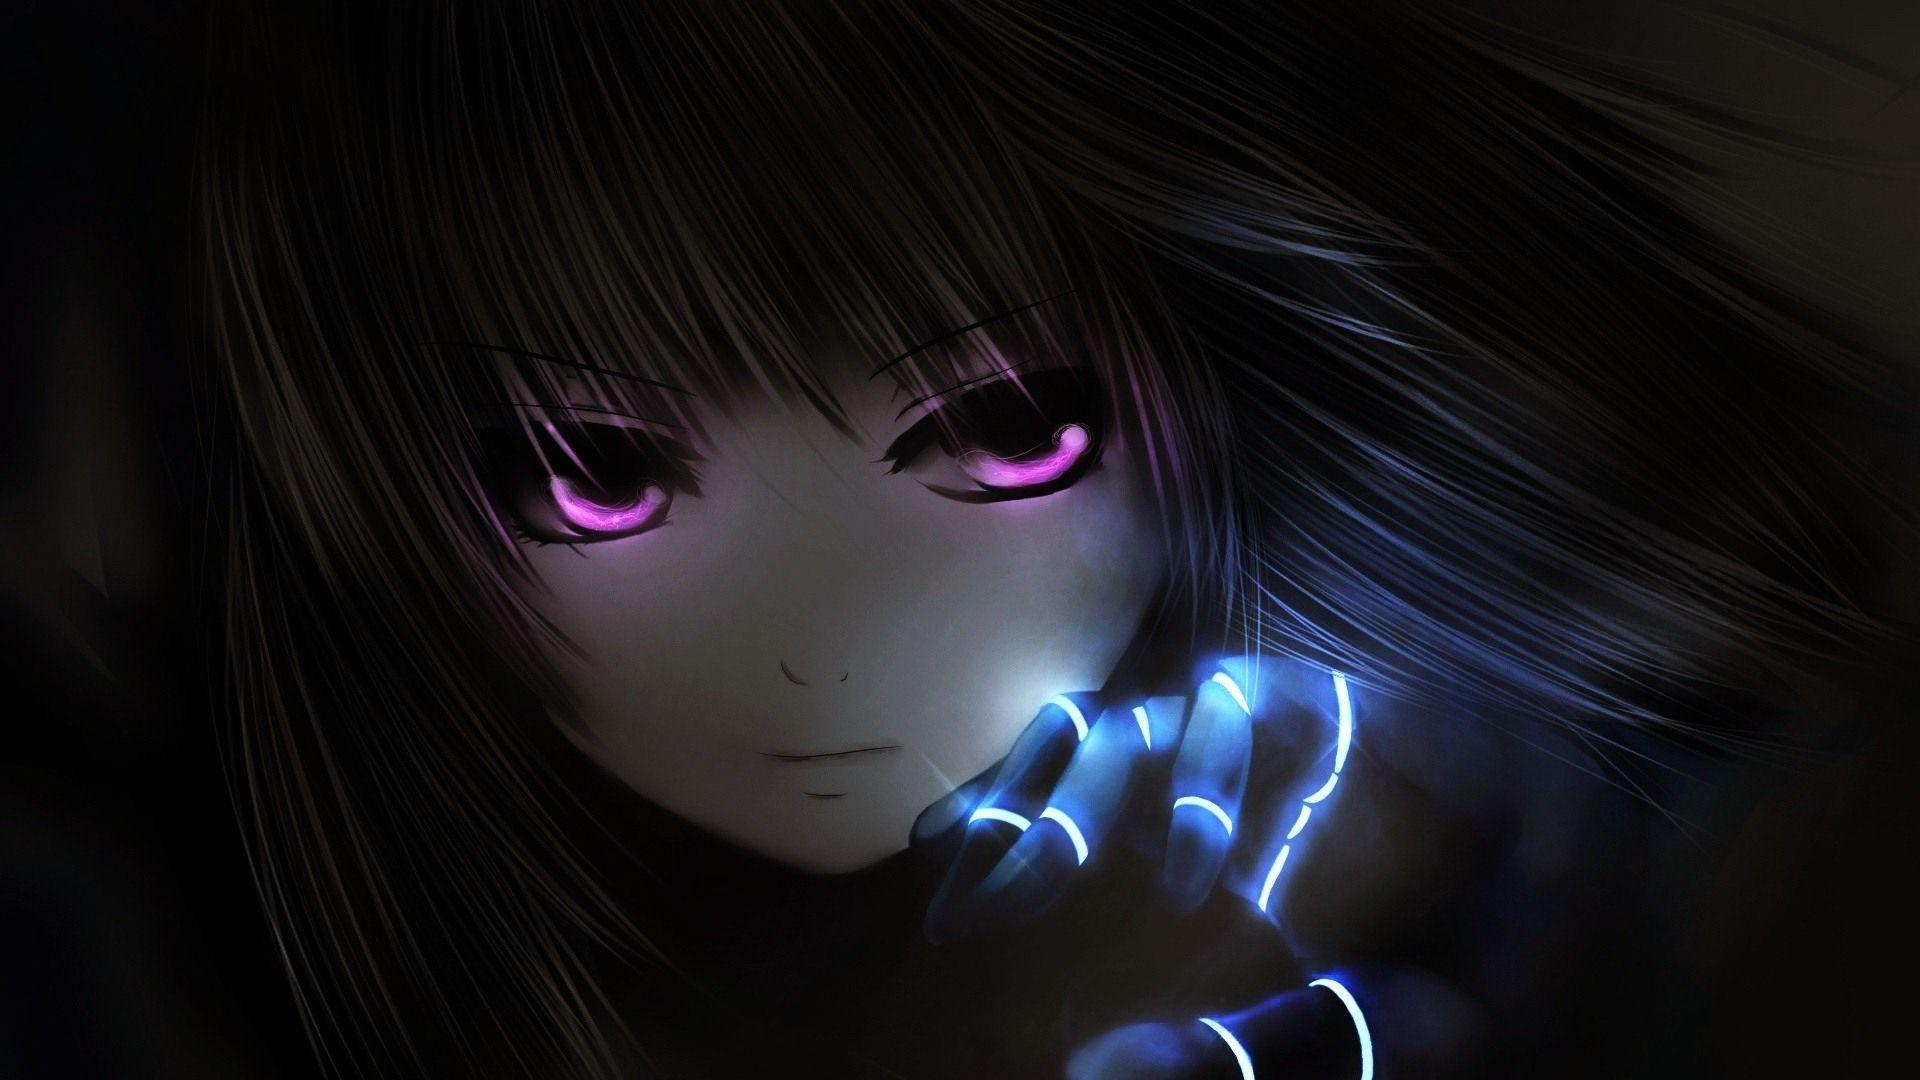 Dark Anime Portrait Hd Wallpapers Wallpaper Cave